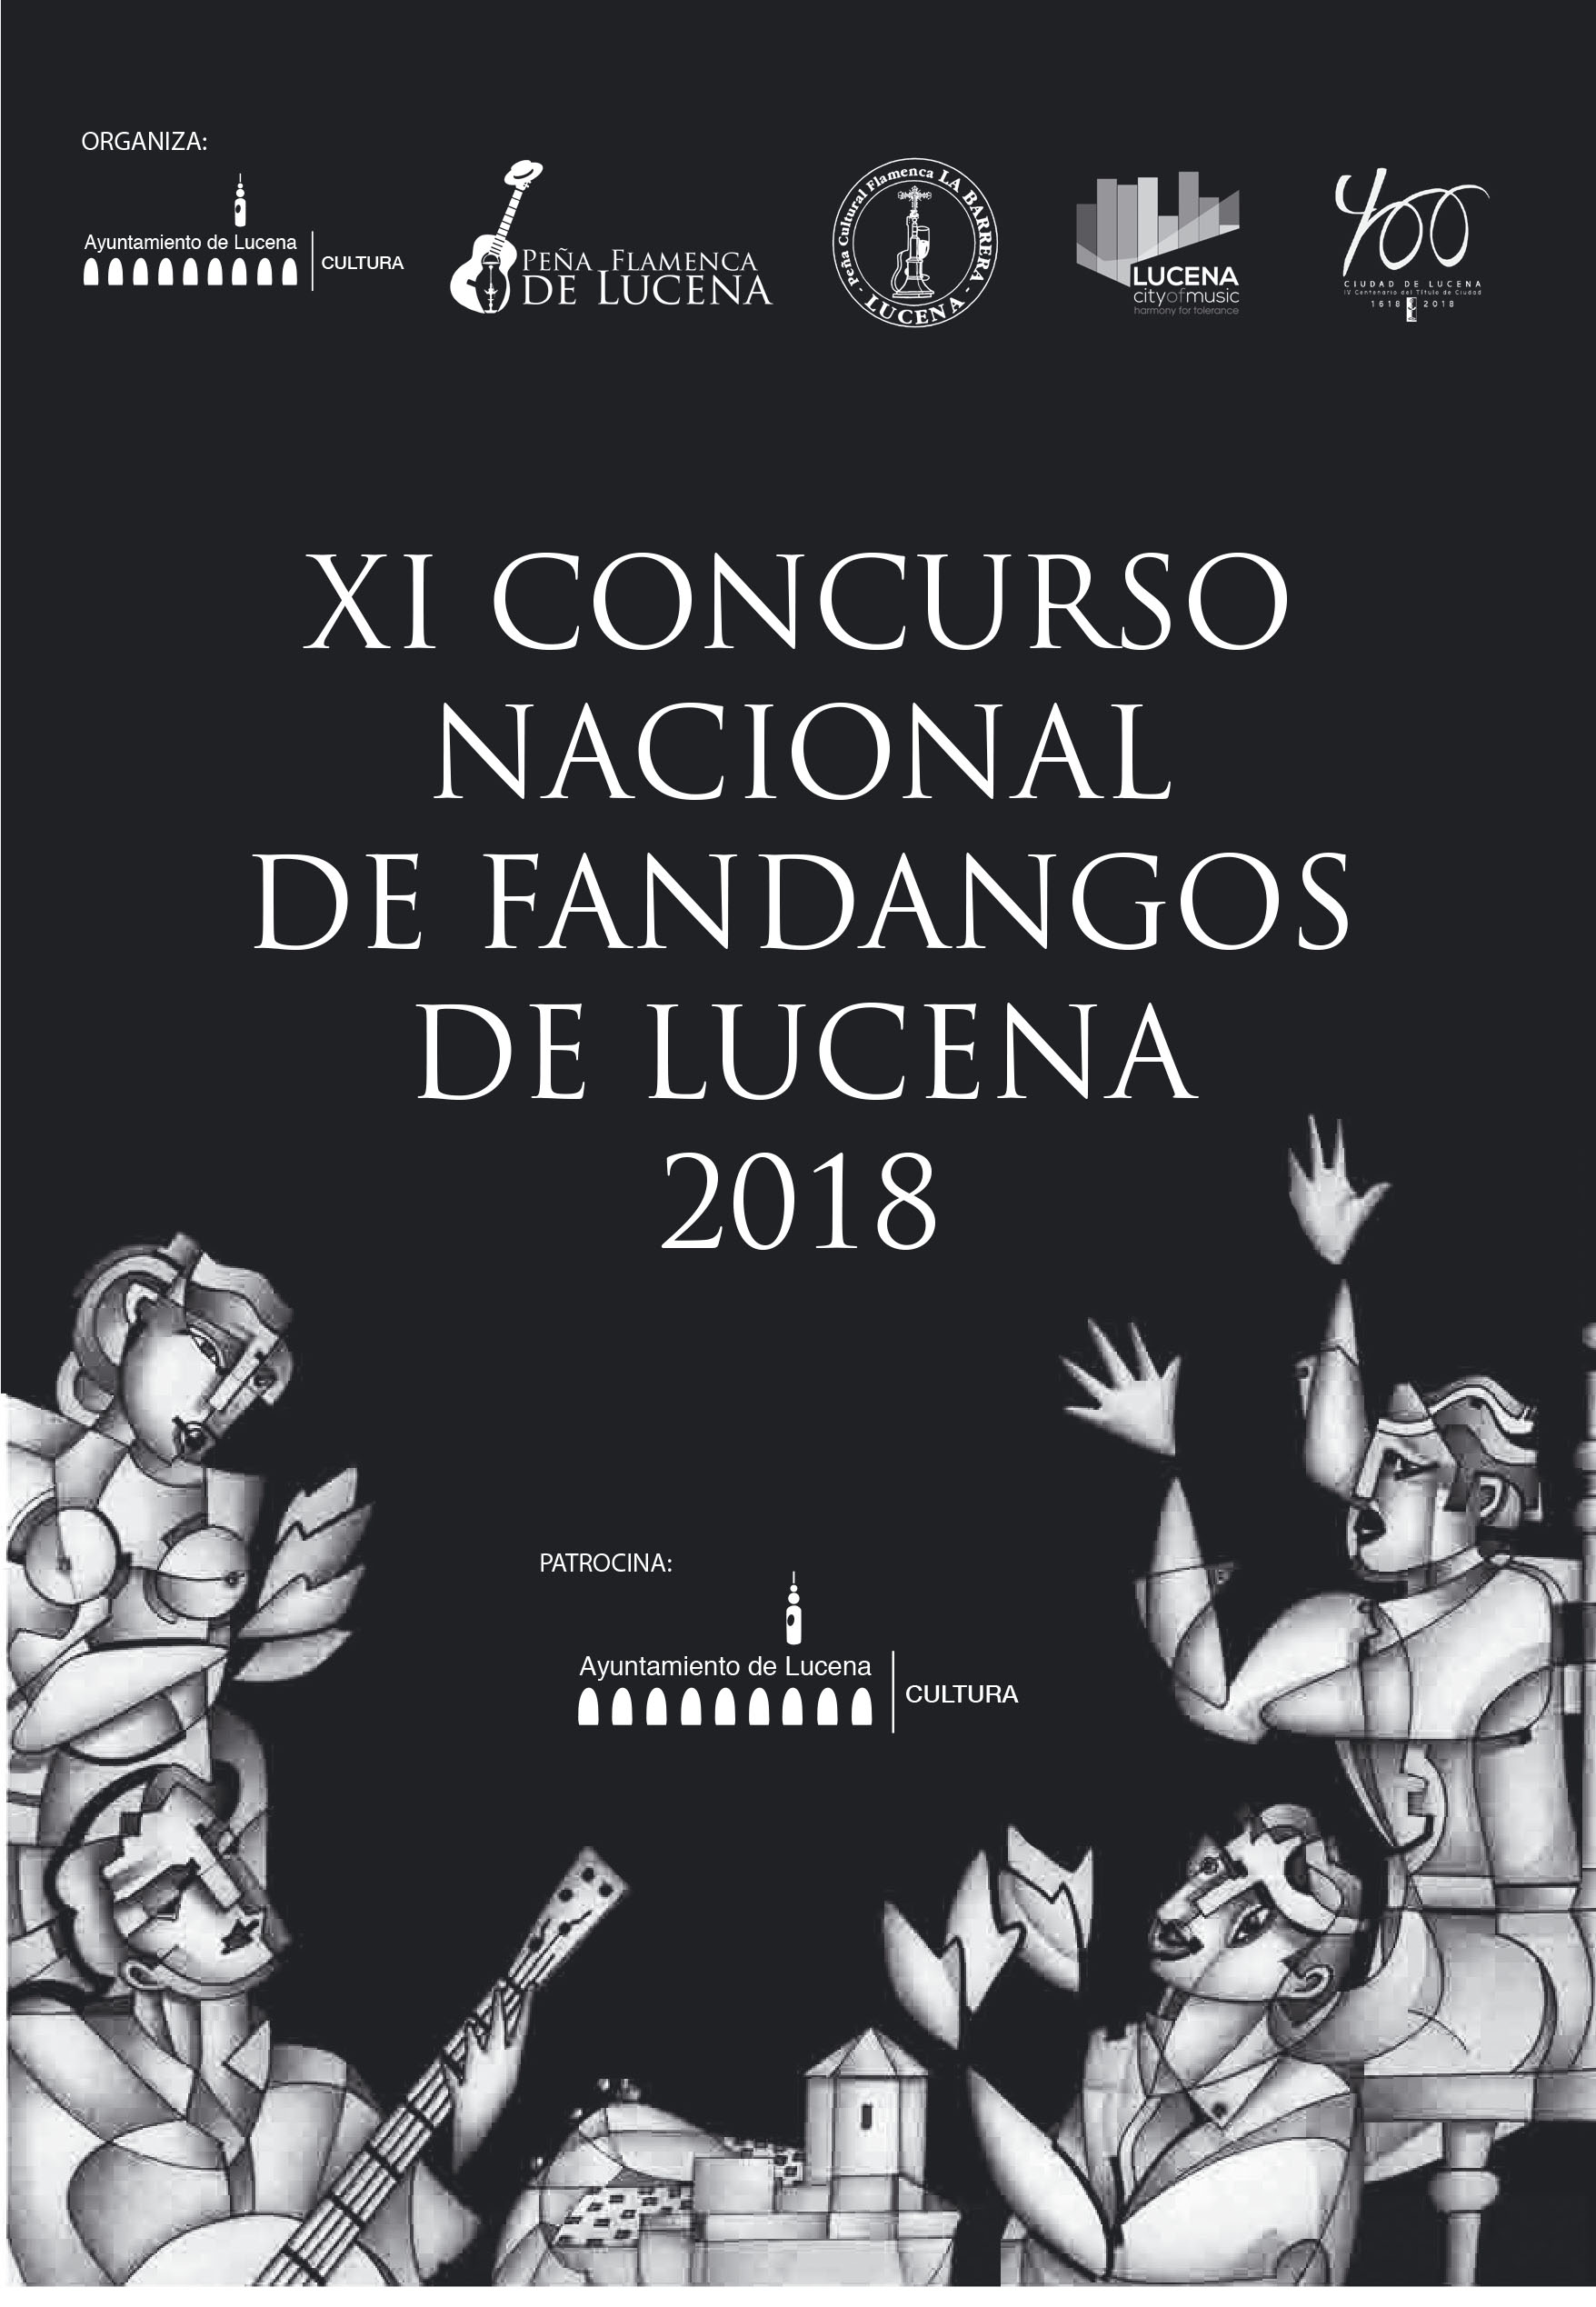 XI CONCURSO NACIONAL DE FANDANGOS DE LUCENA 2018 @ Casa de los Mora